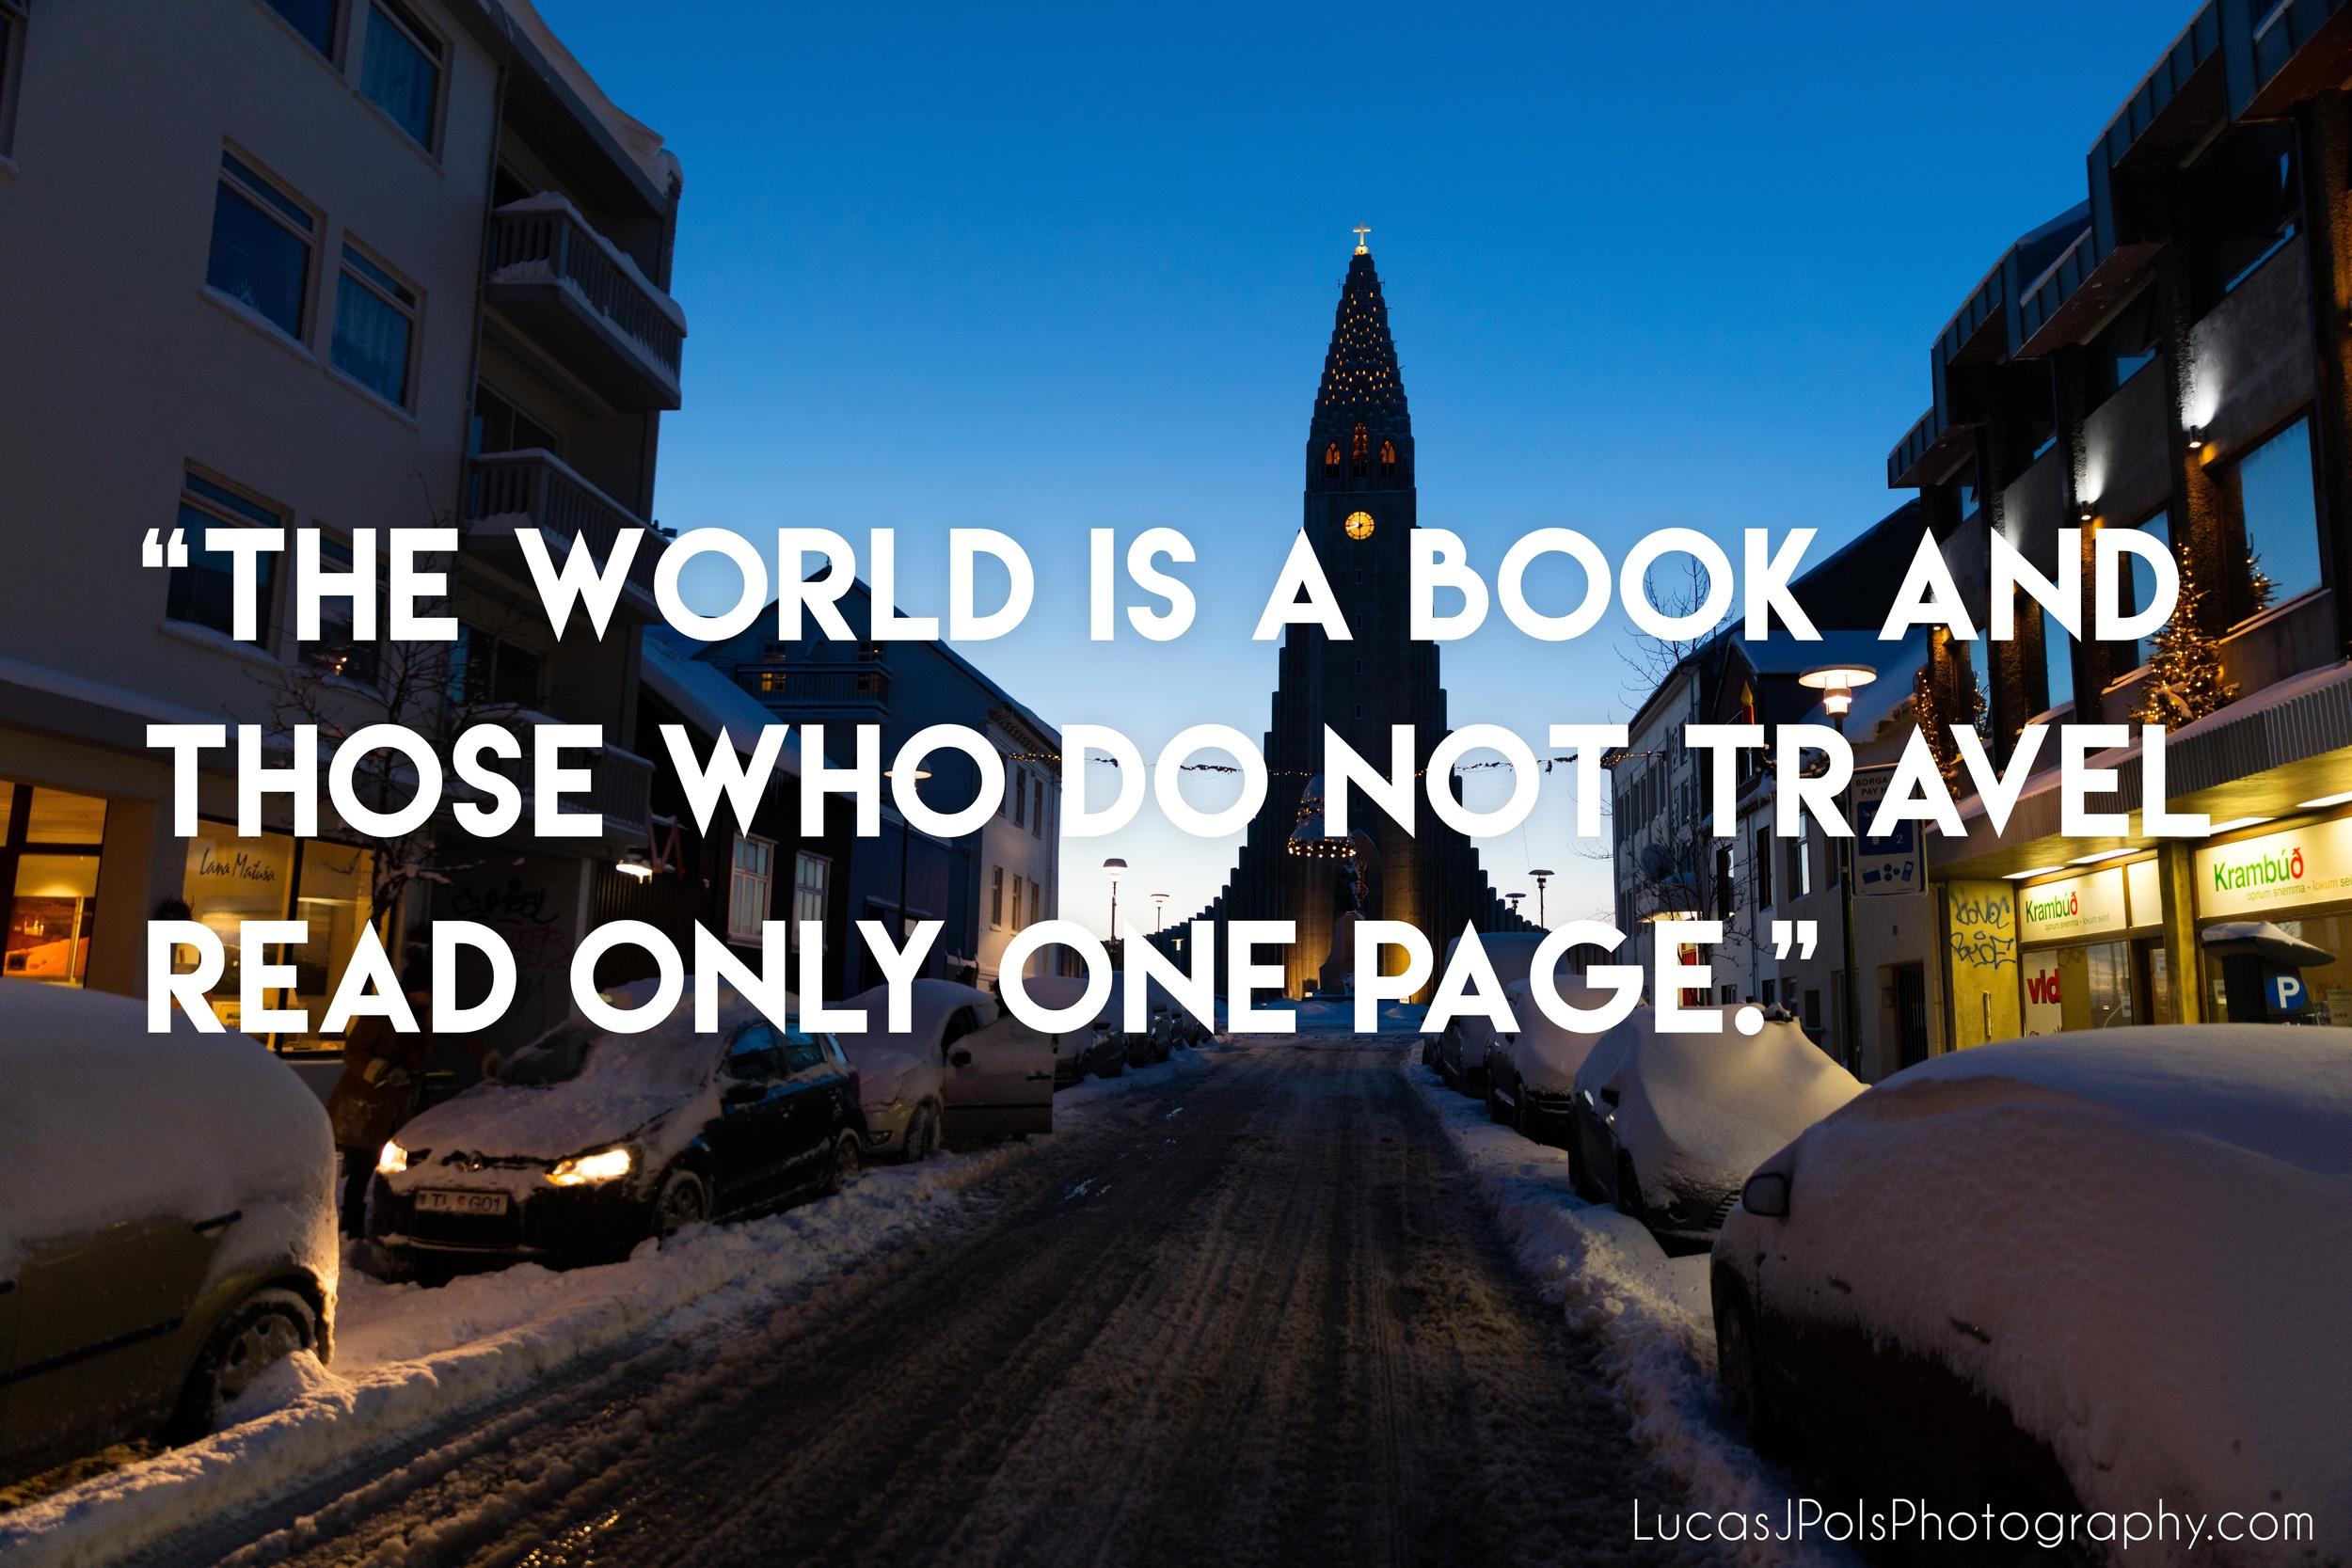 Travel Quote, LucasJPolsPhotography.com